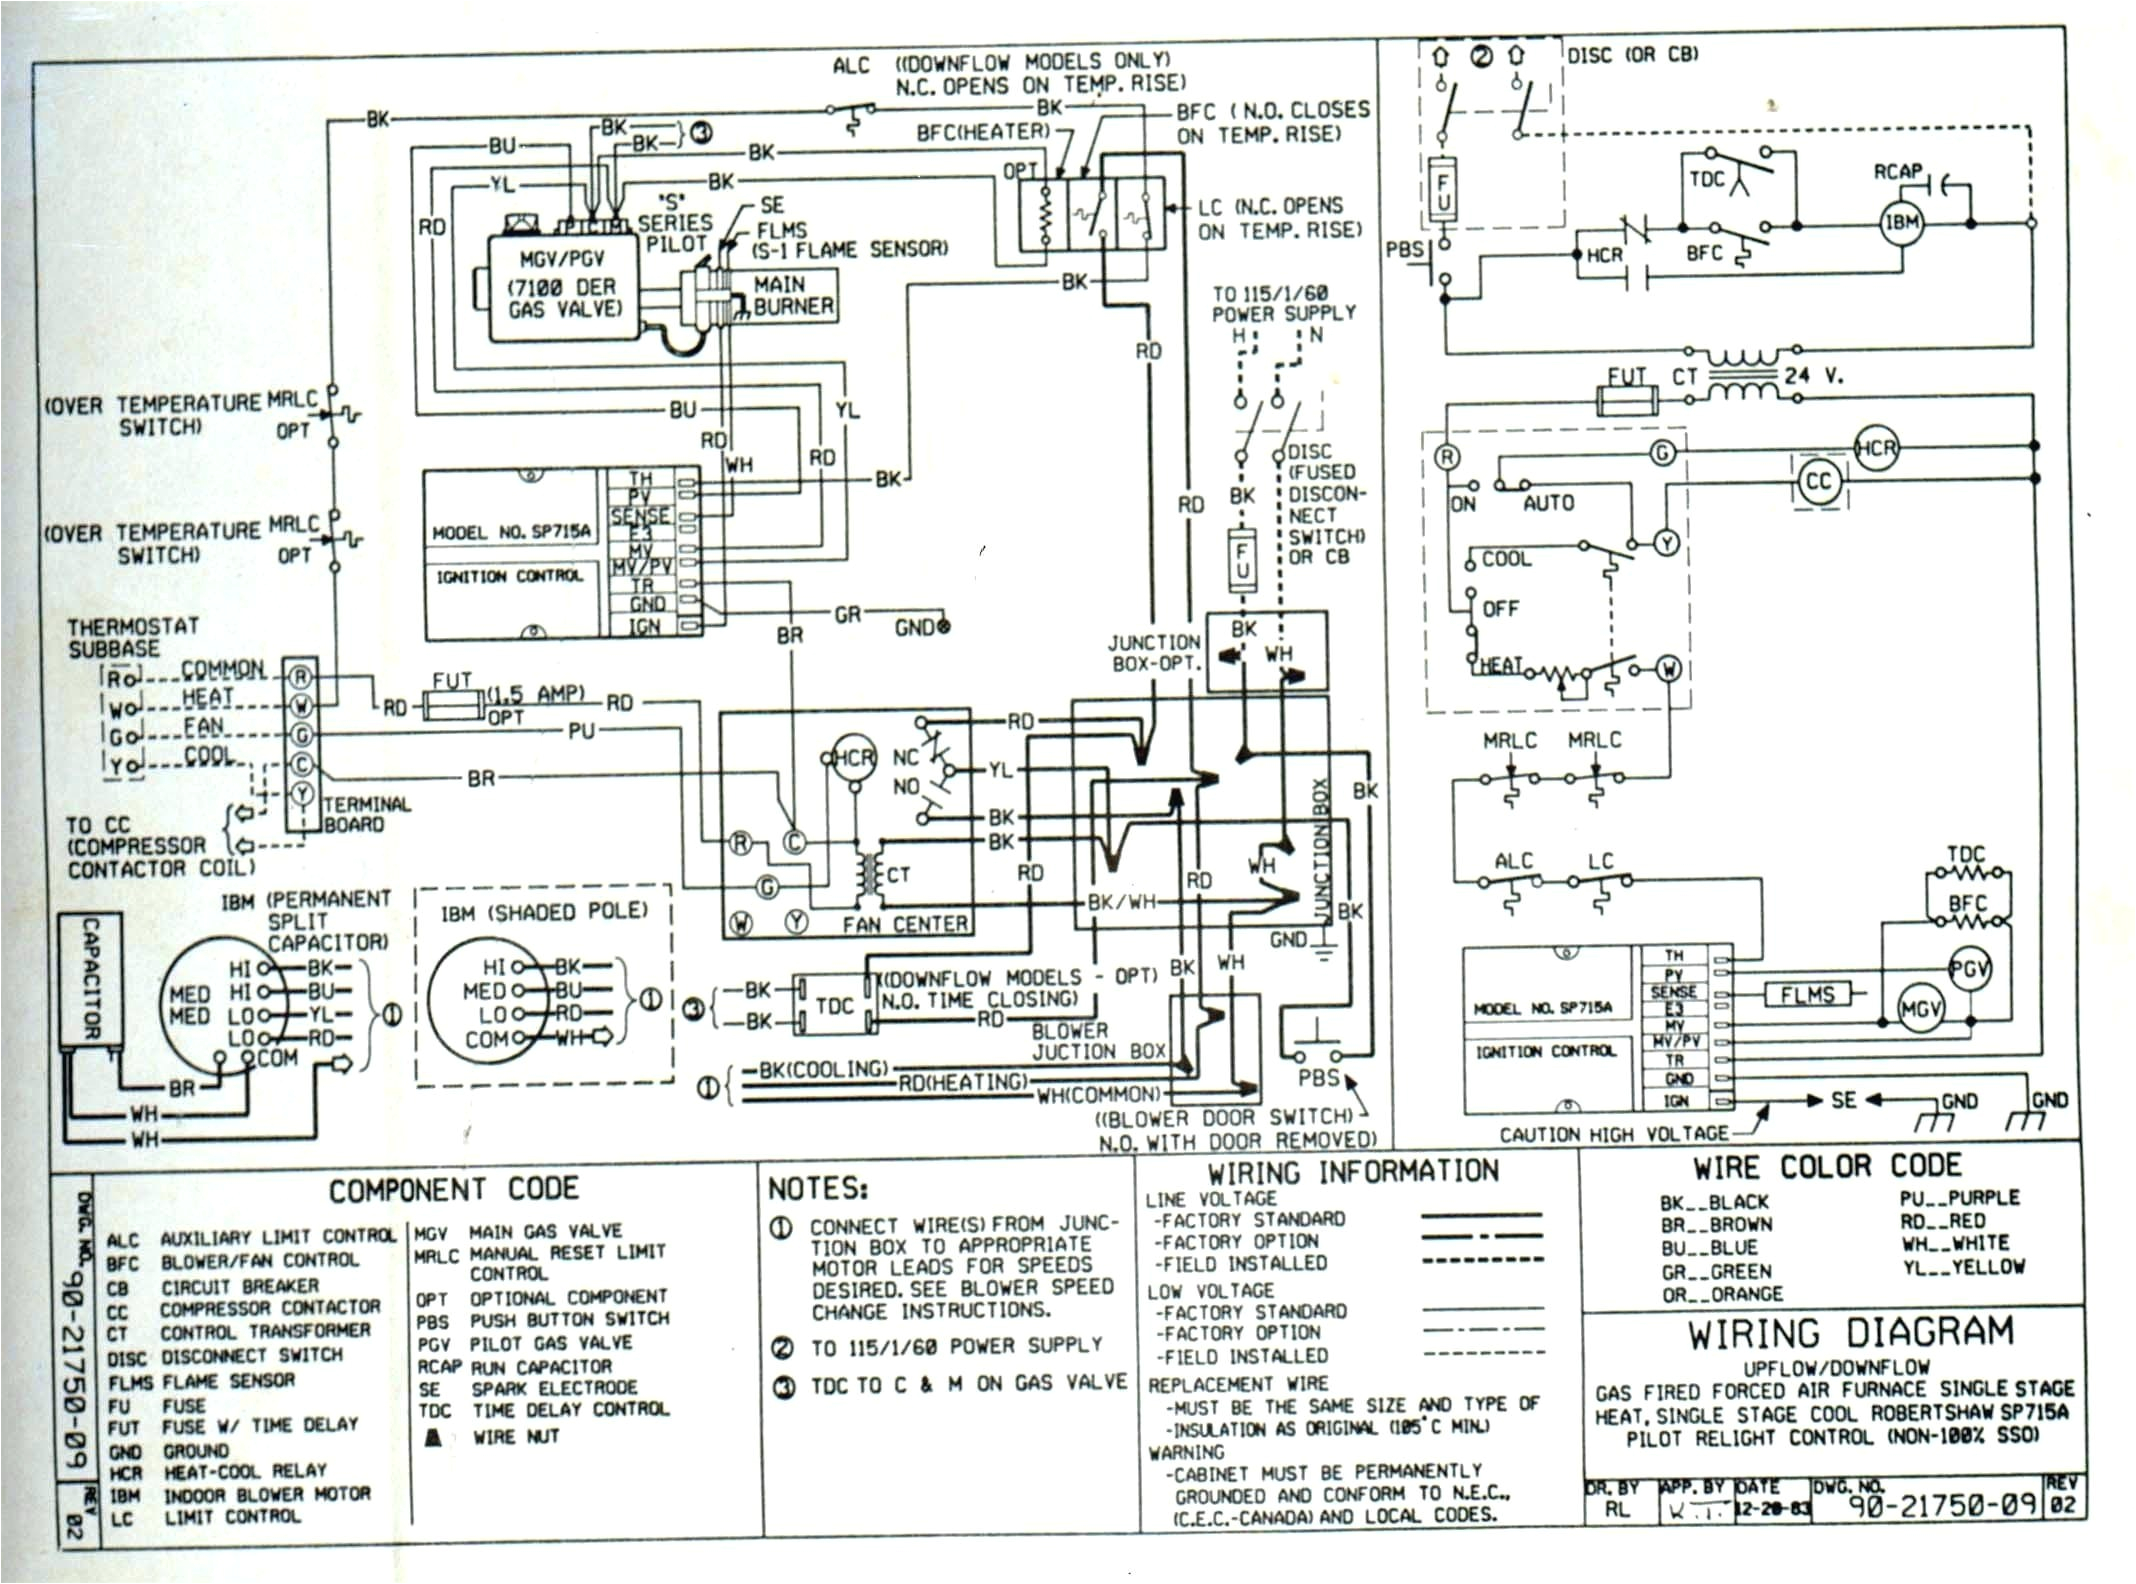 trane hvac schematics wiring diagram page trane mua unit wiring diagram